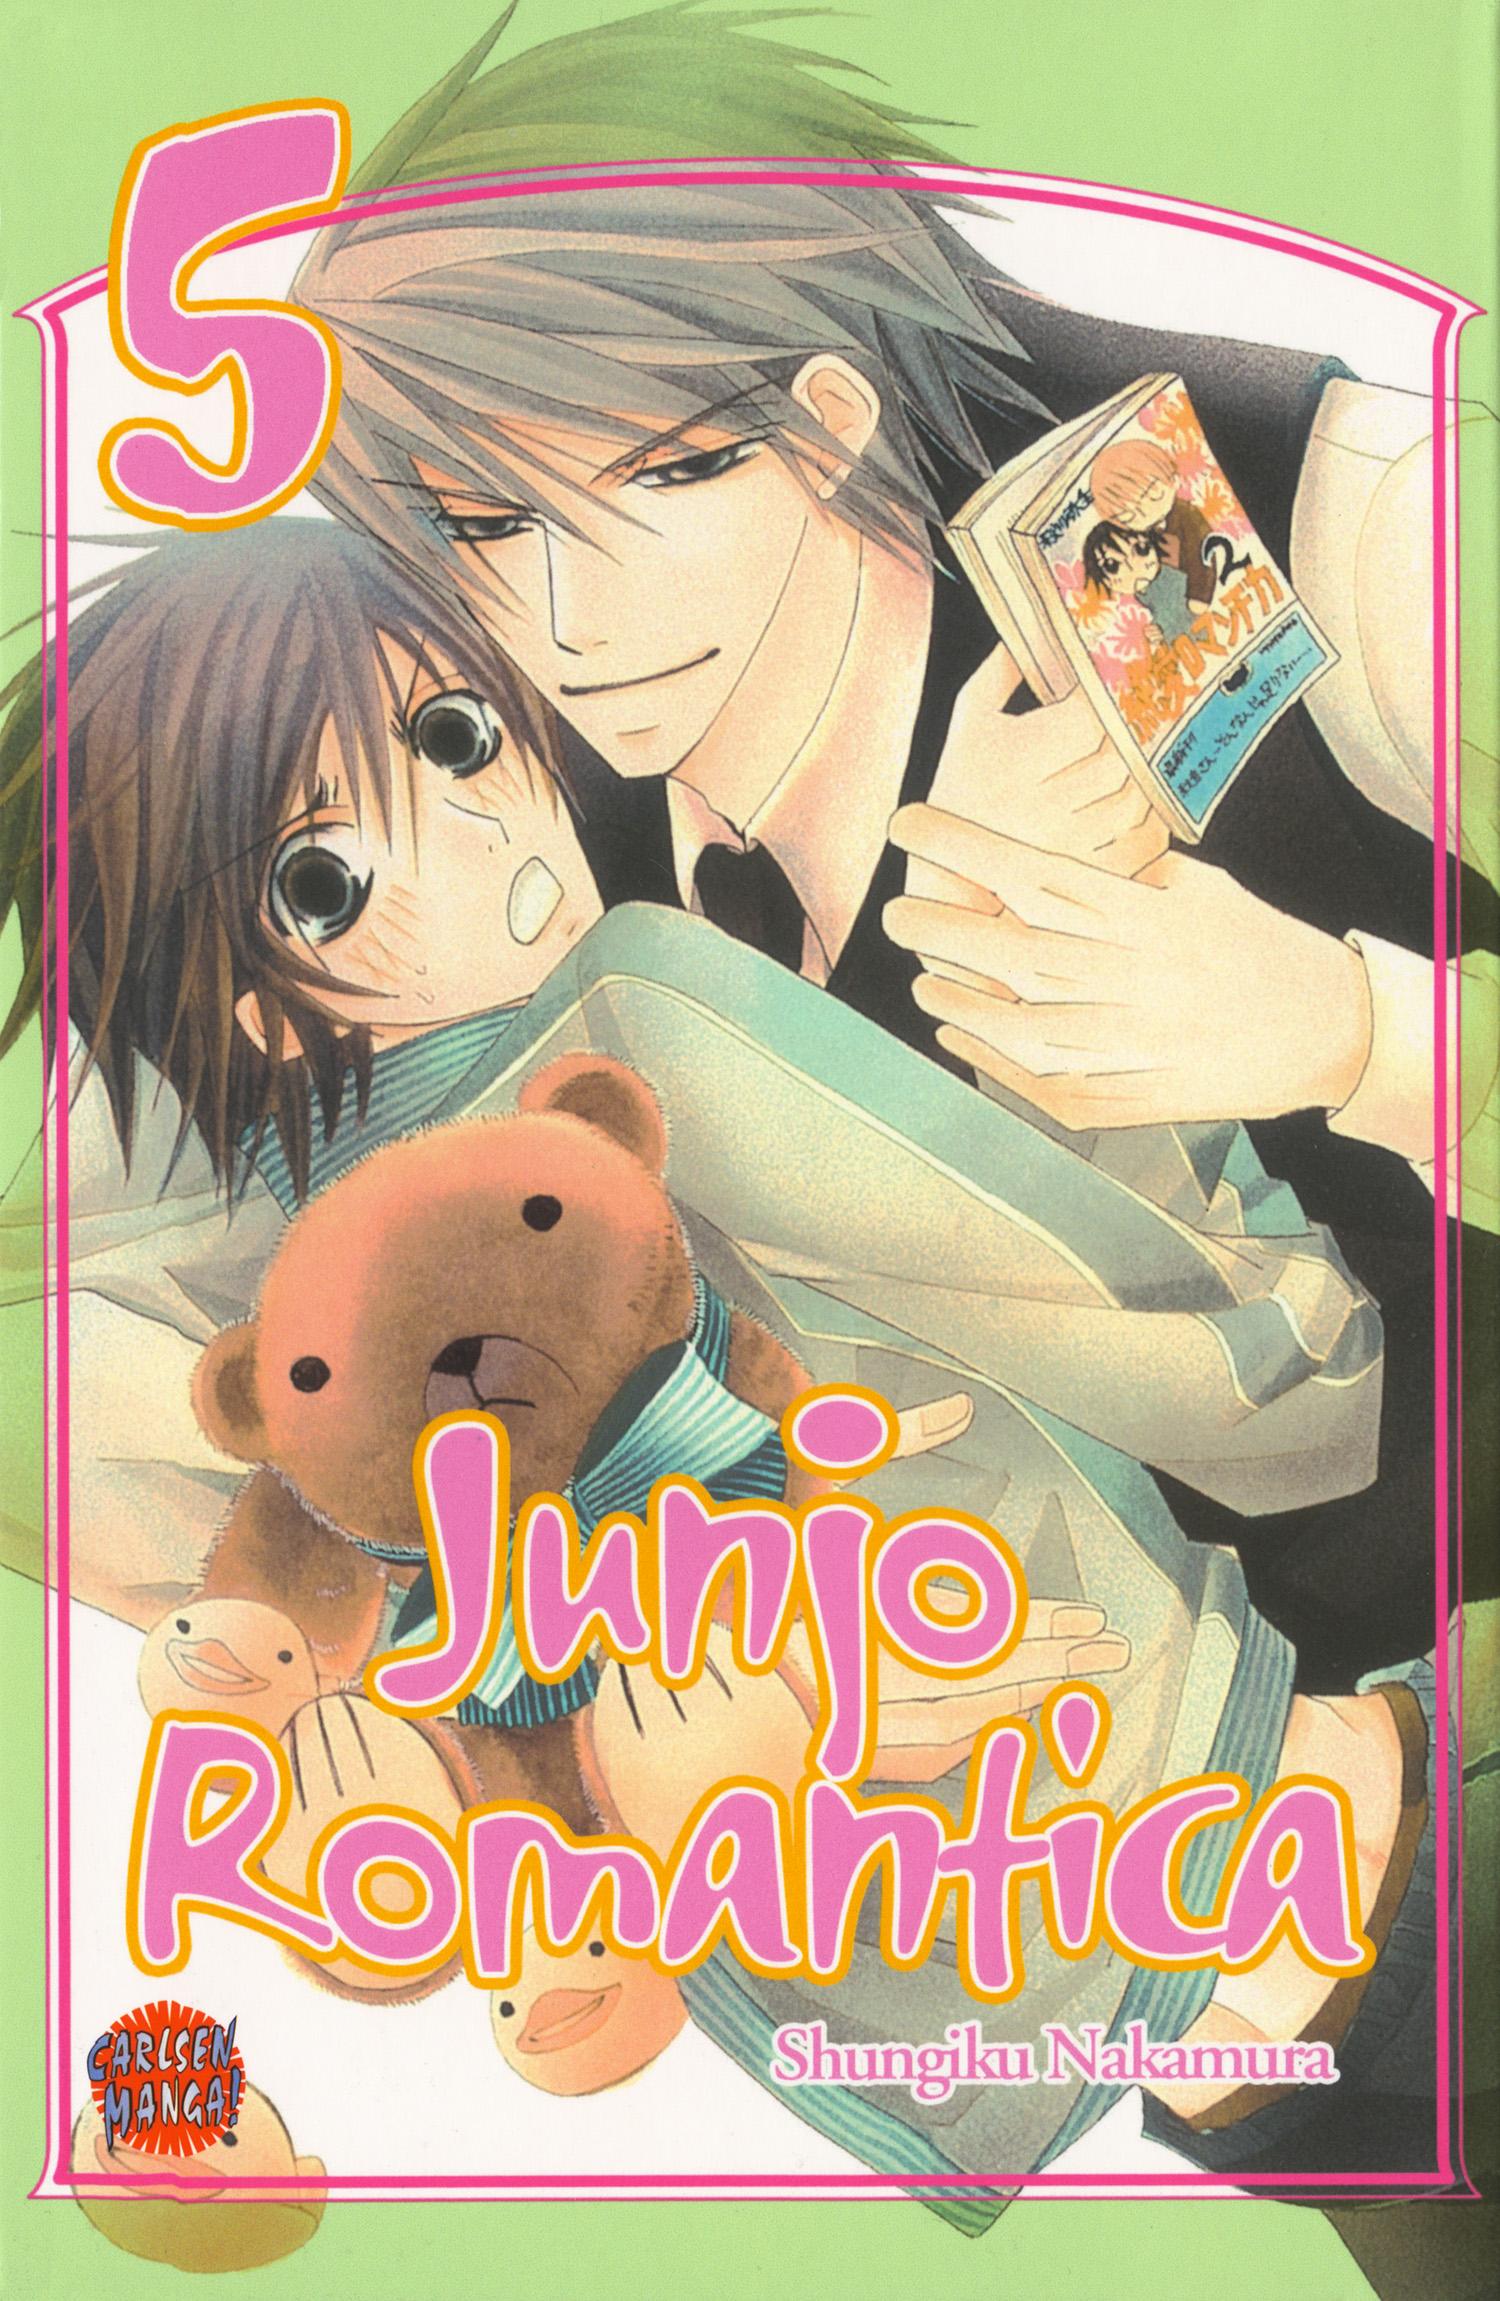 Junjou Romantica: Junjo Romantica 5 - Minitokyo